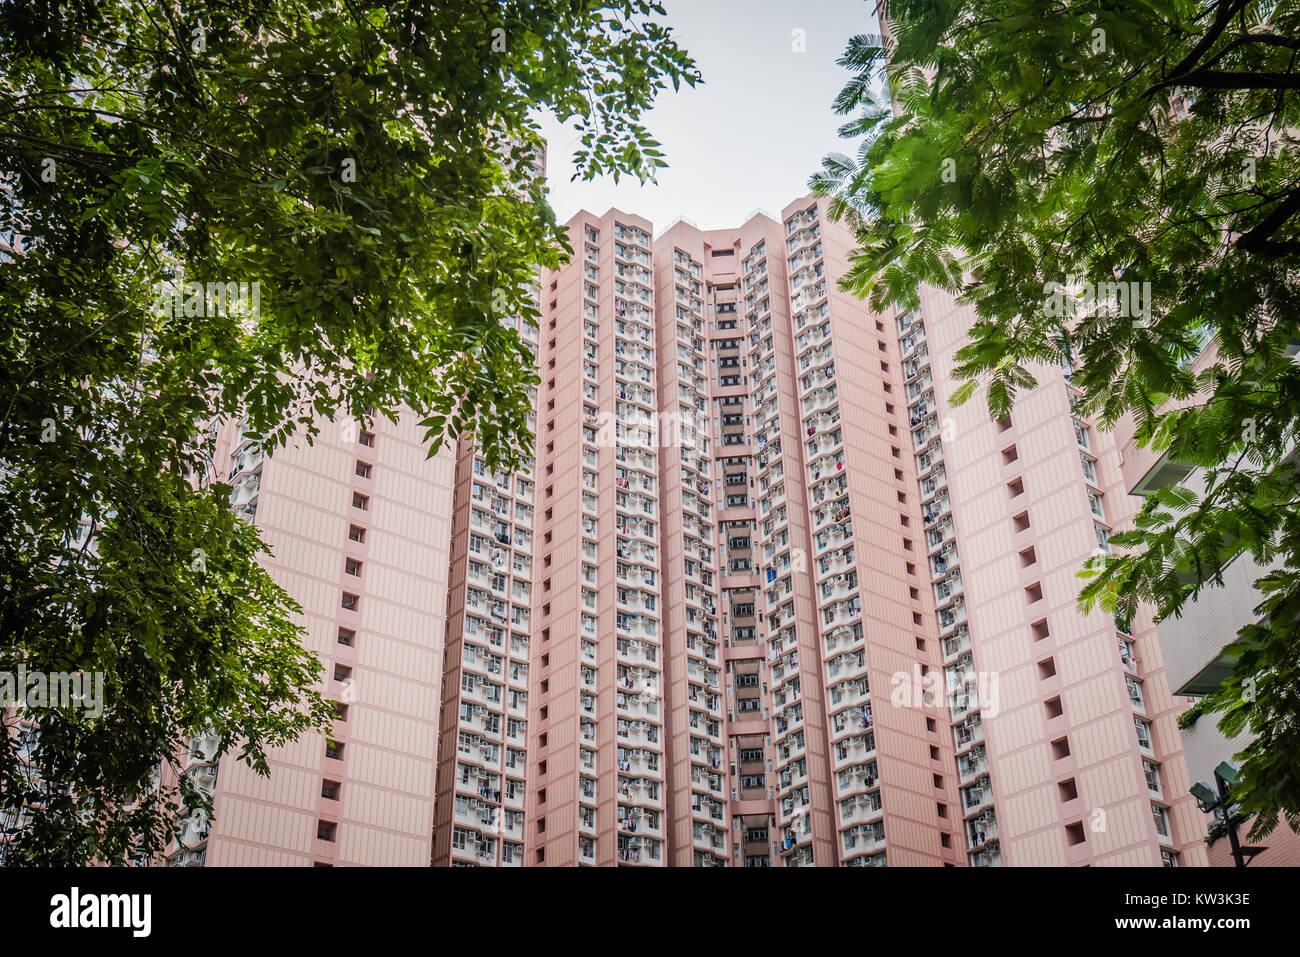 hong kong public housing apartments - Stock Image